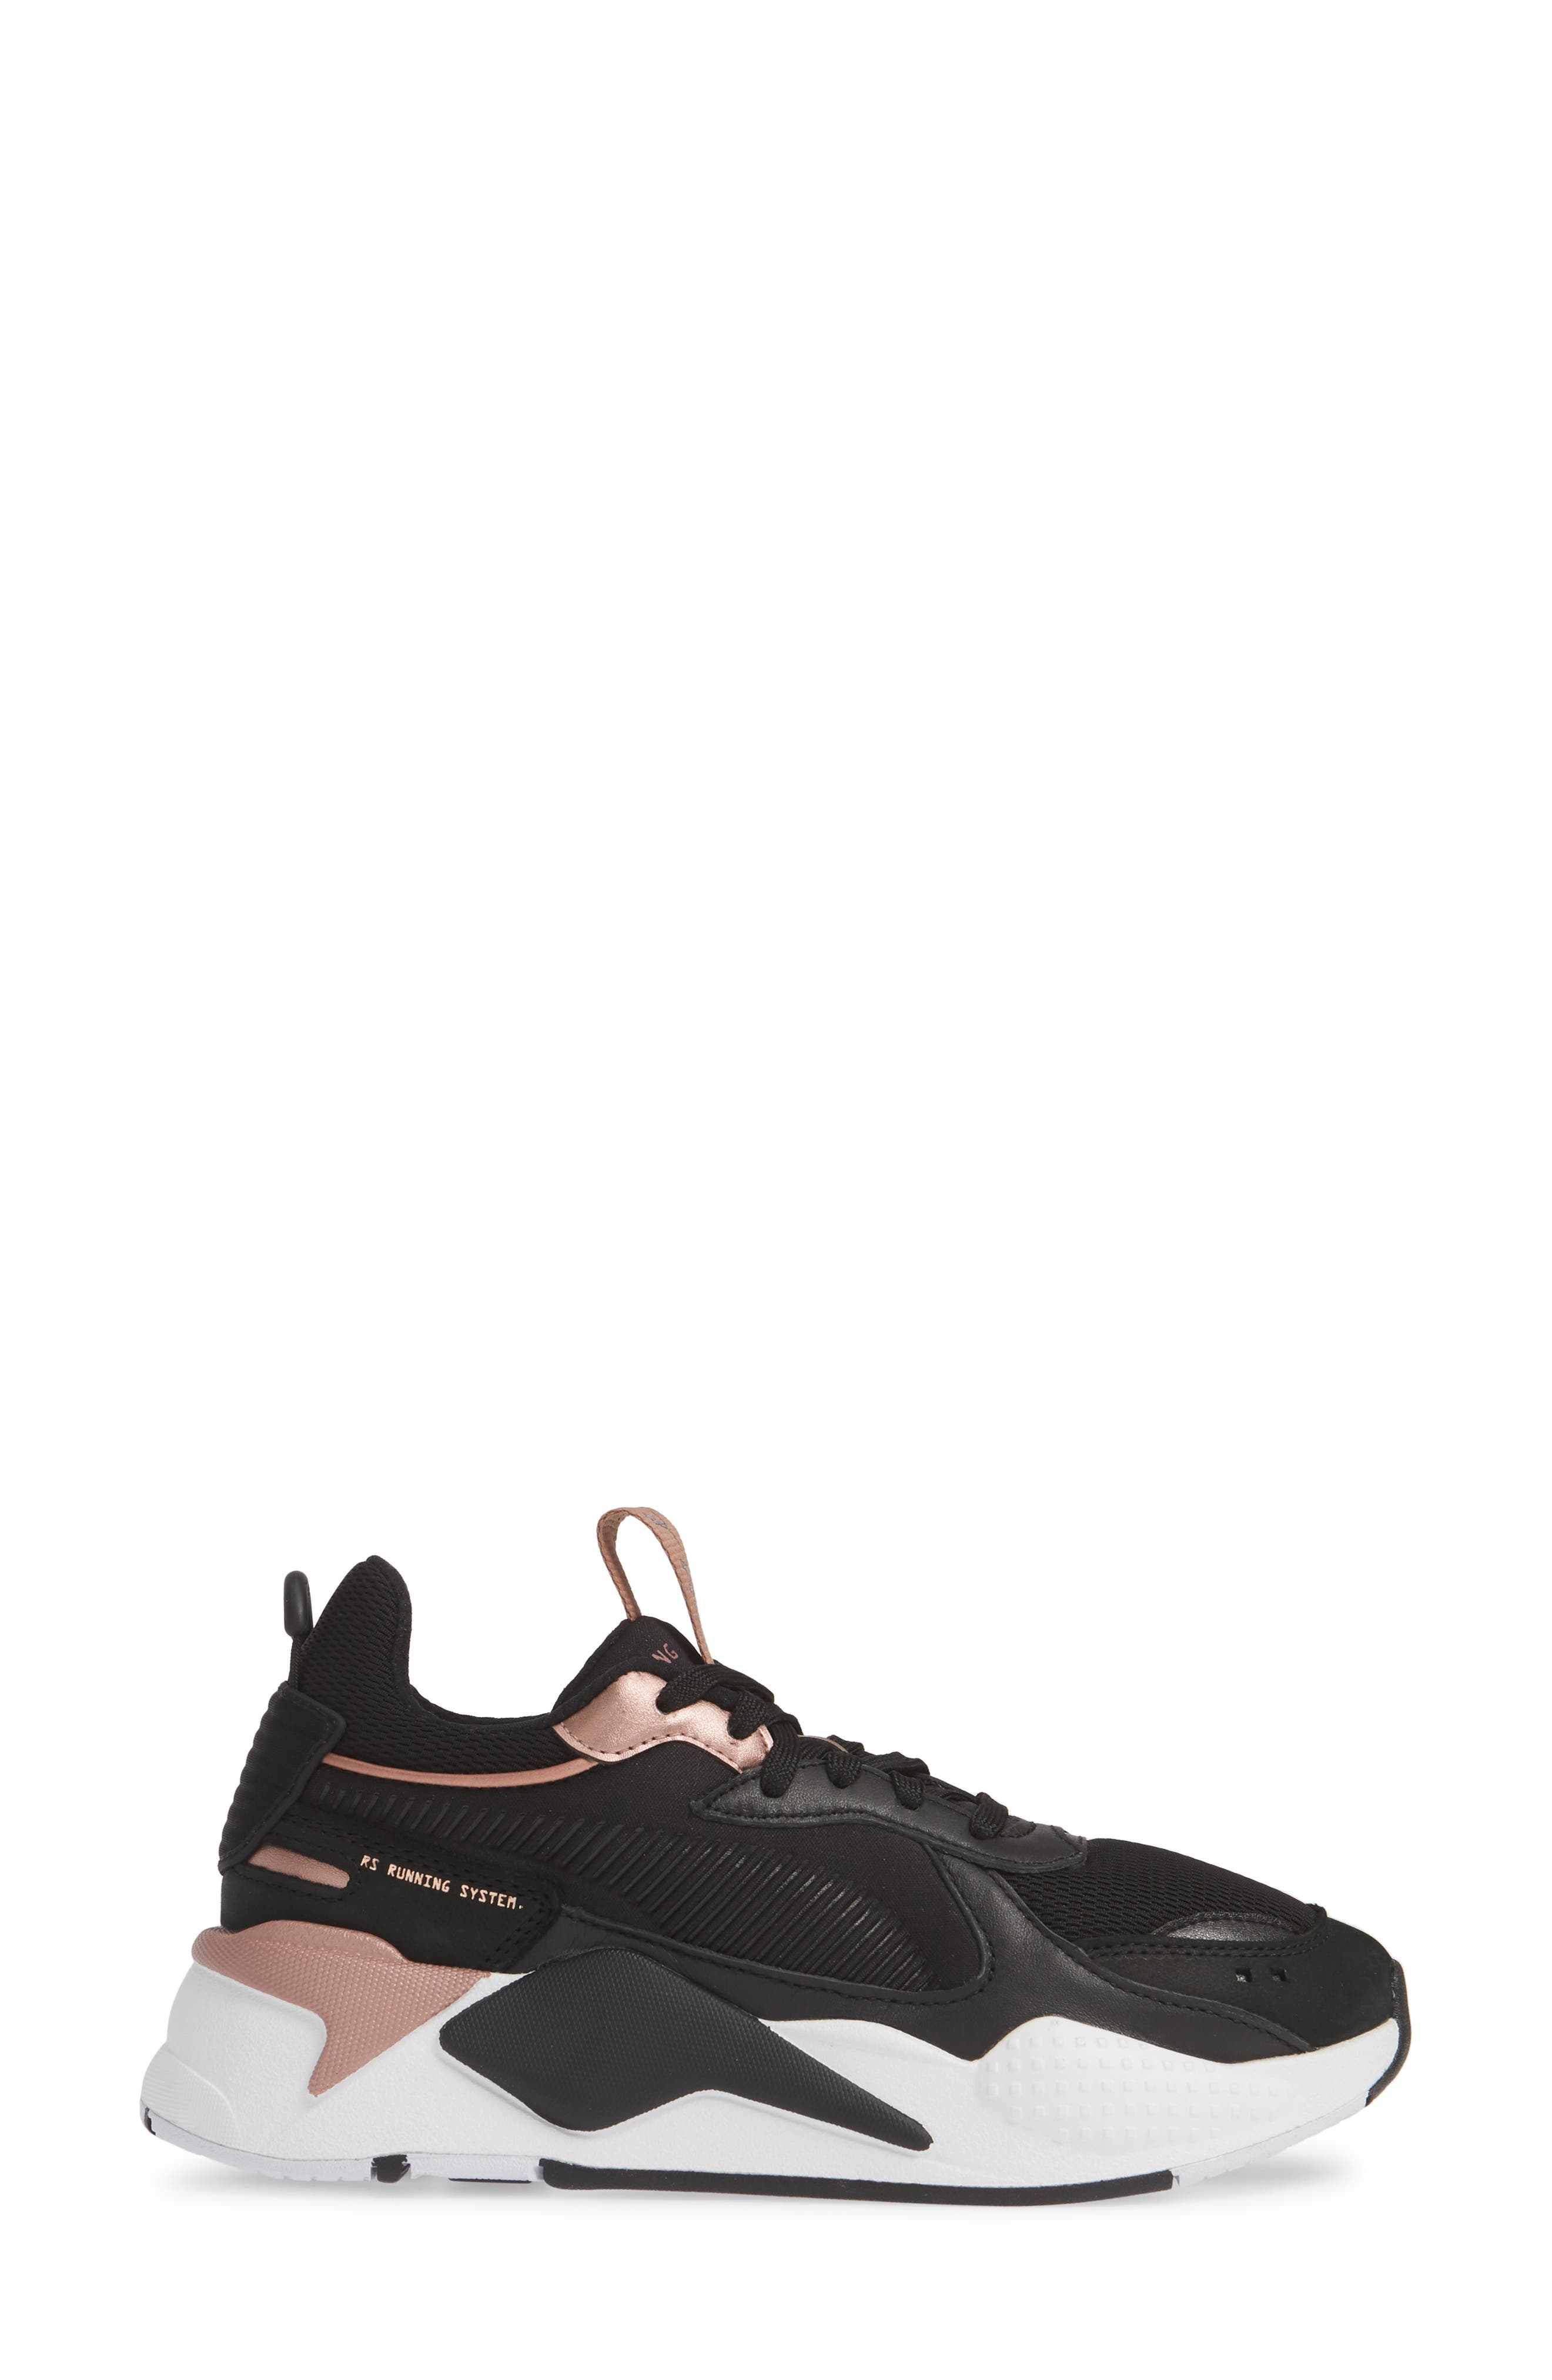 PUMA, RS-X Trophy Sneaker, Alternate thumbnail 3, color, BLACK/ ROSE GOLD